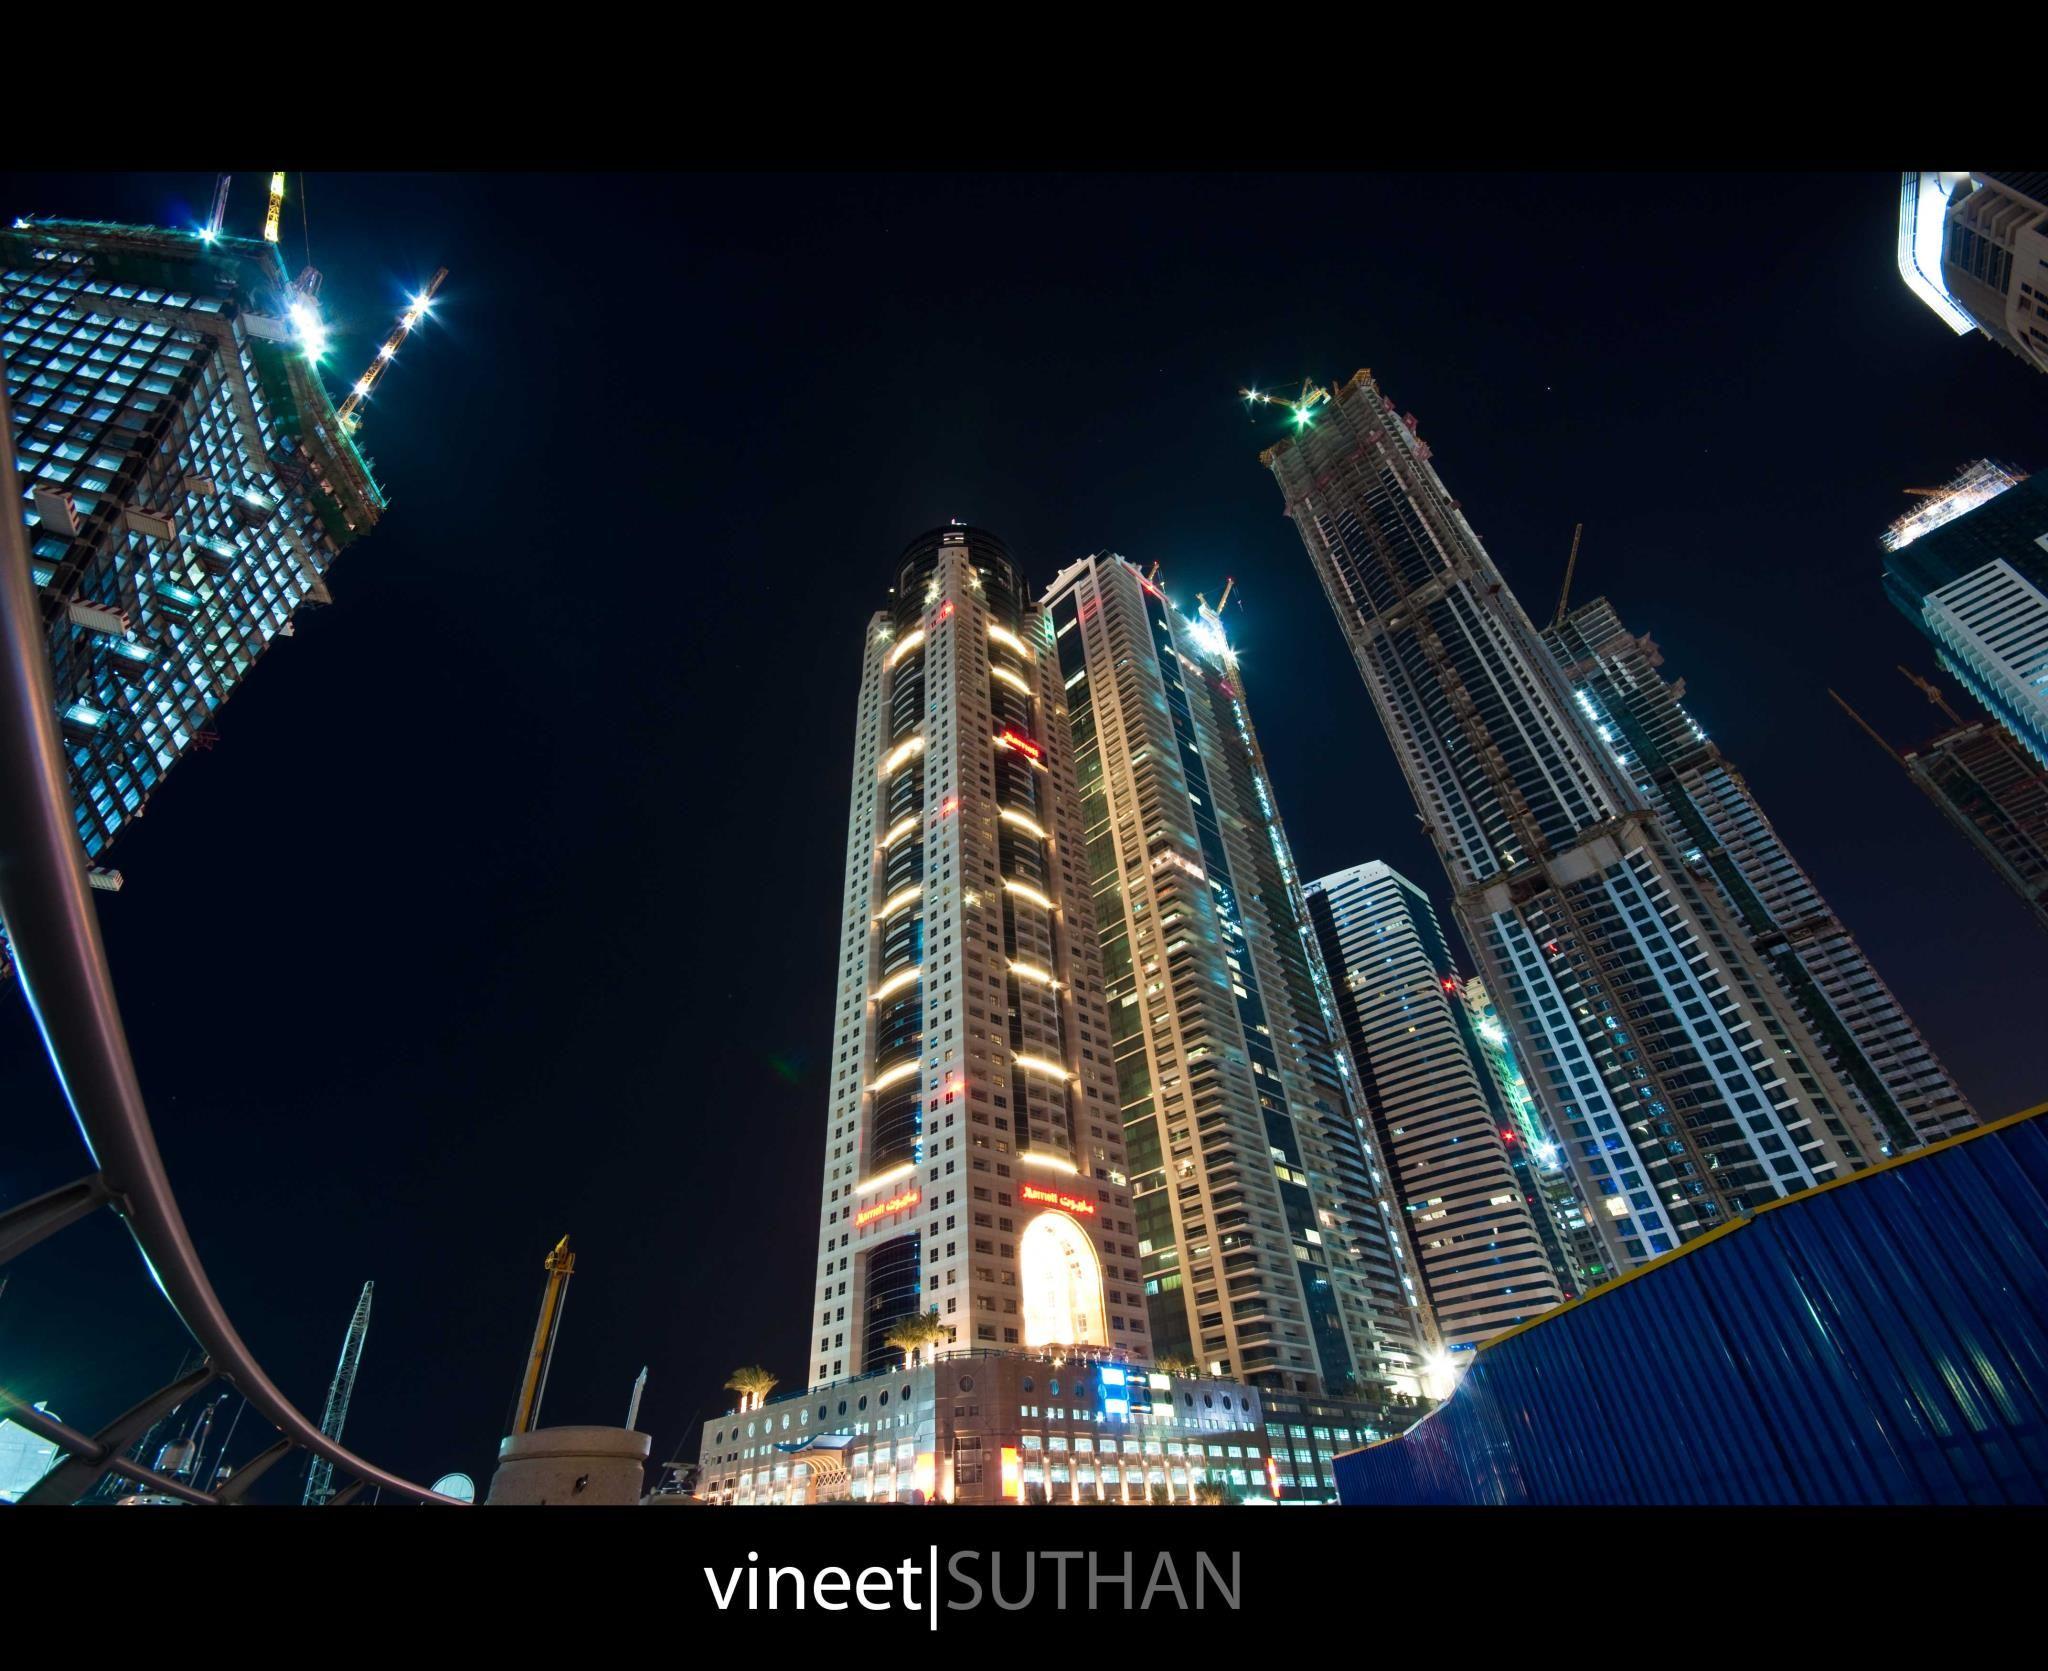 Jumeirah Dubai United Arab Emirates Jumeirah Dubai